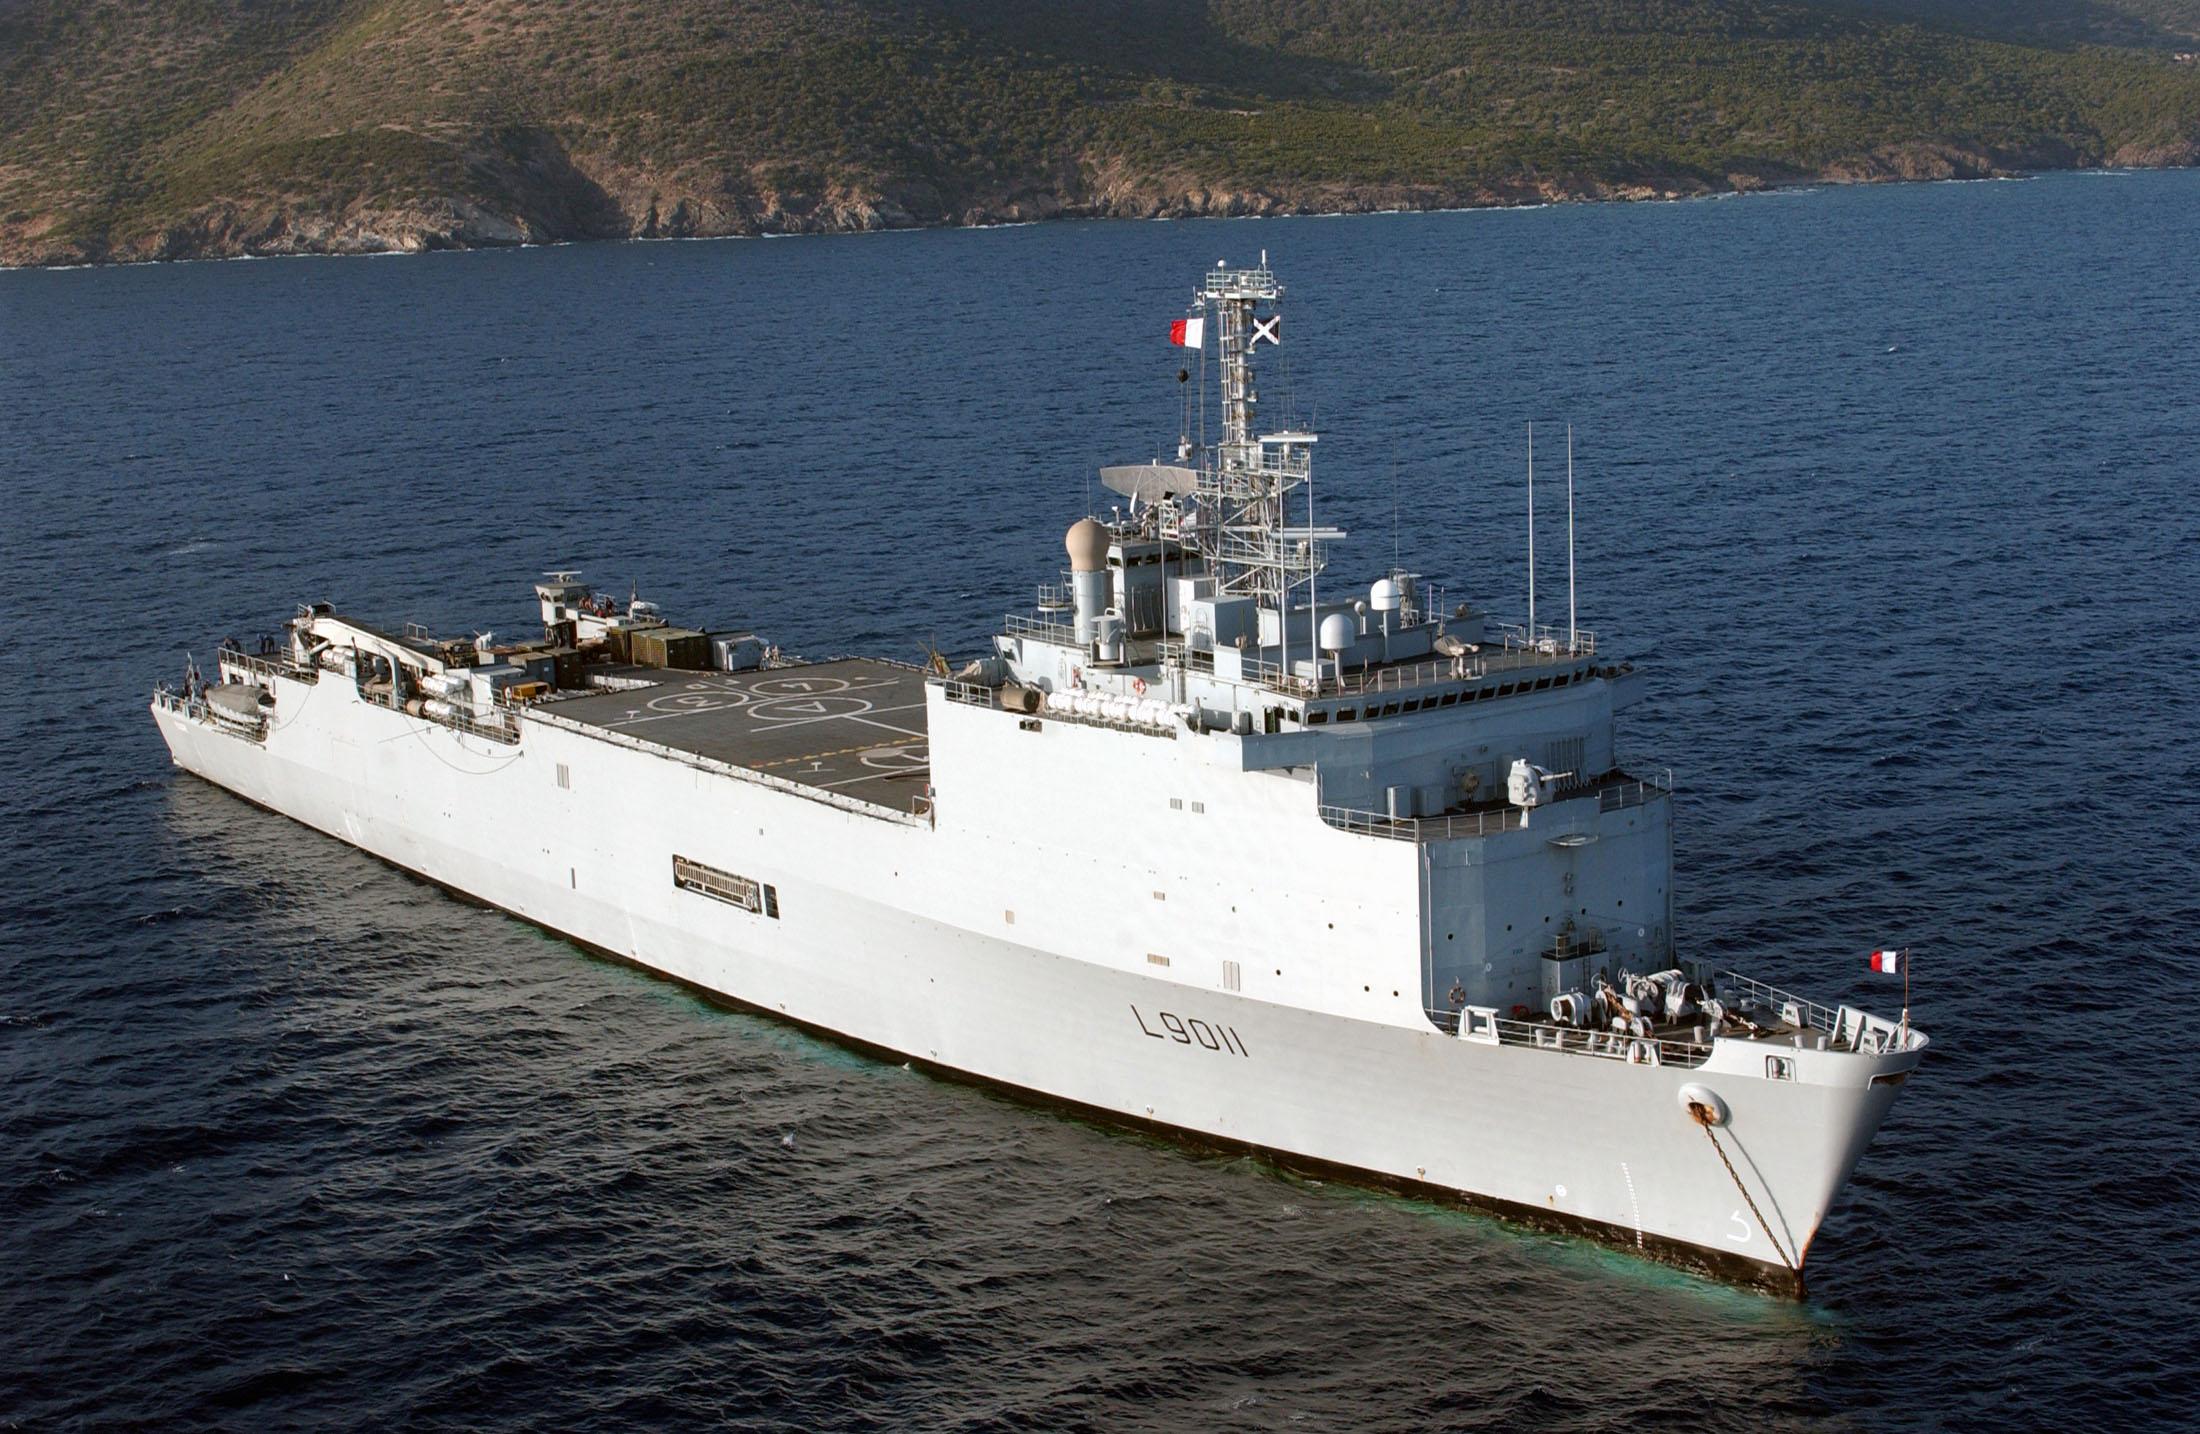 https://i0.wp.com/www.naval.com.br/blog/wp-content/uploads/2010/06/FoudreL9011.jpg